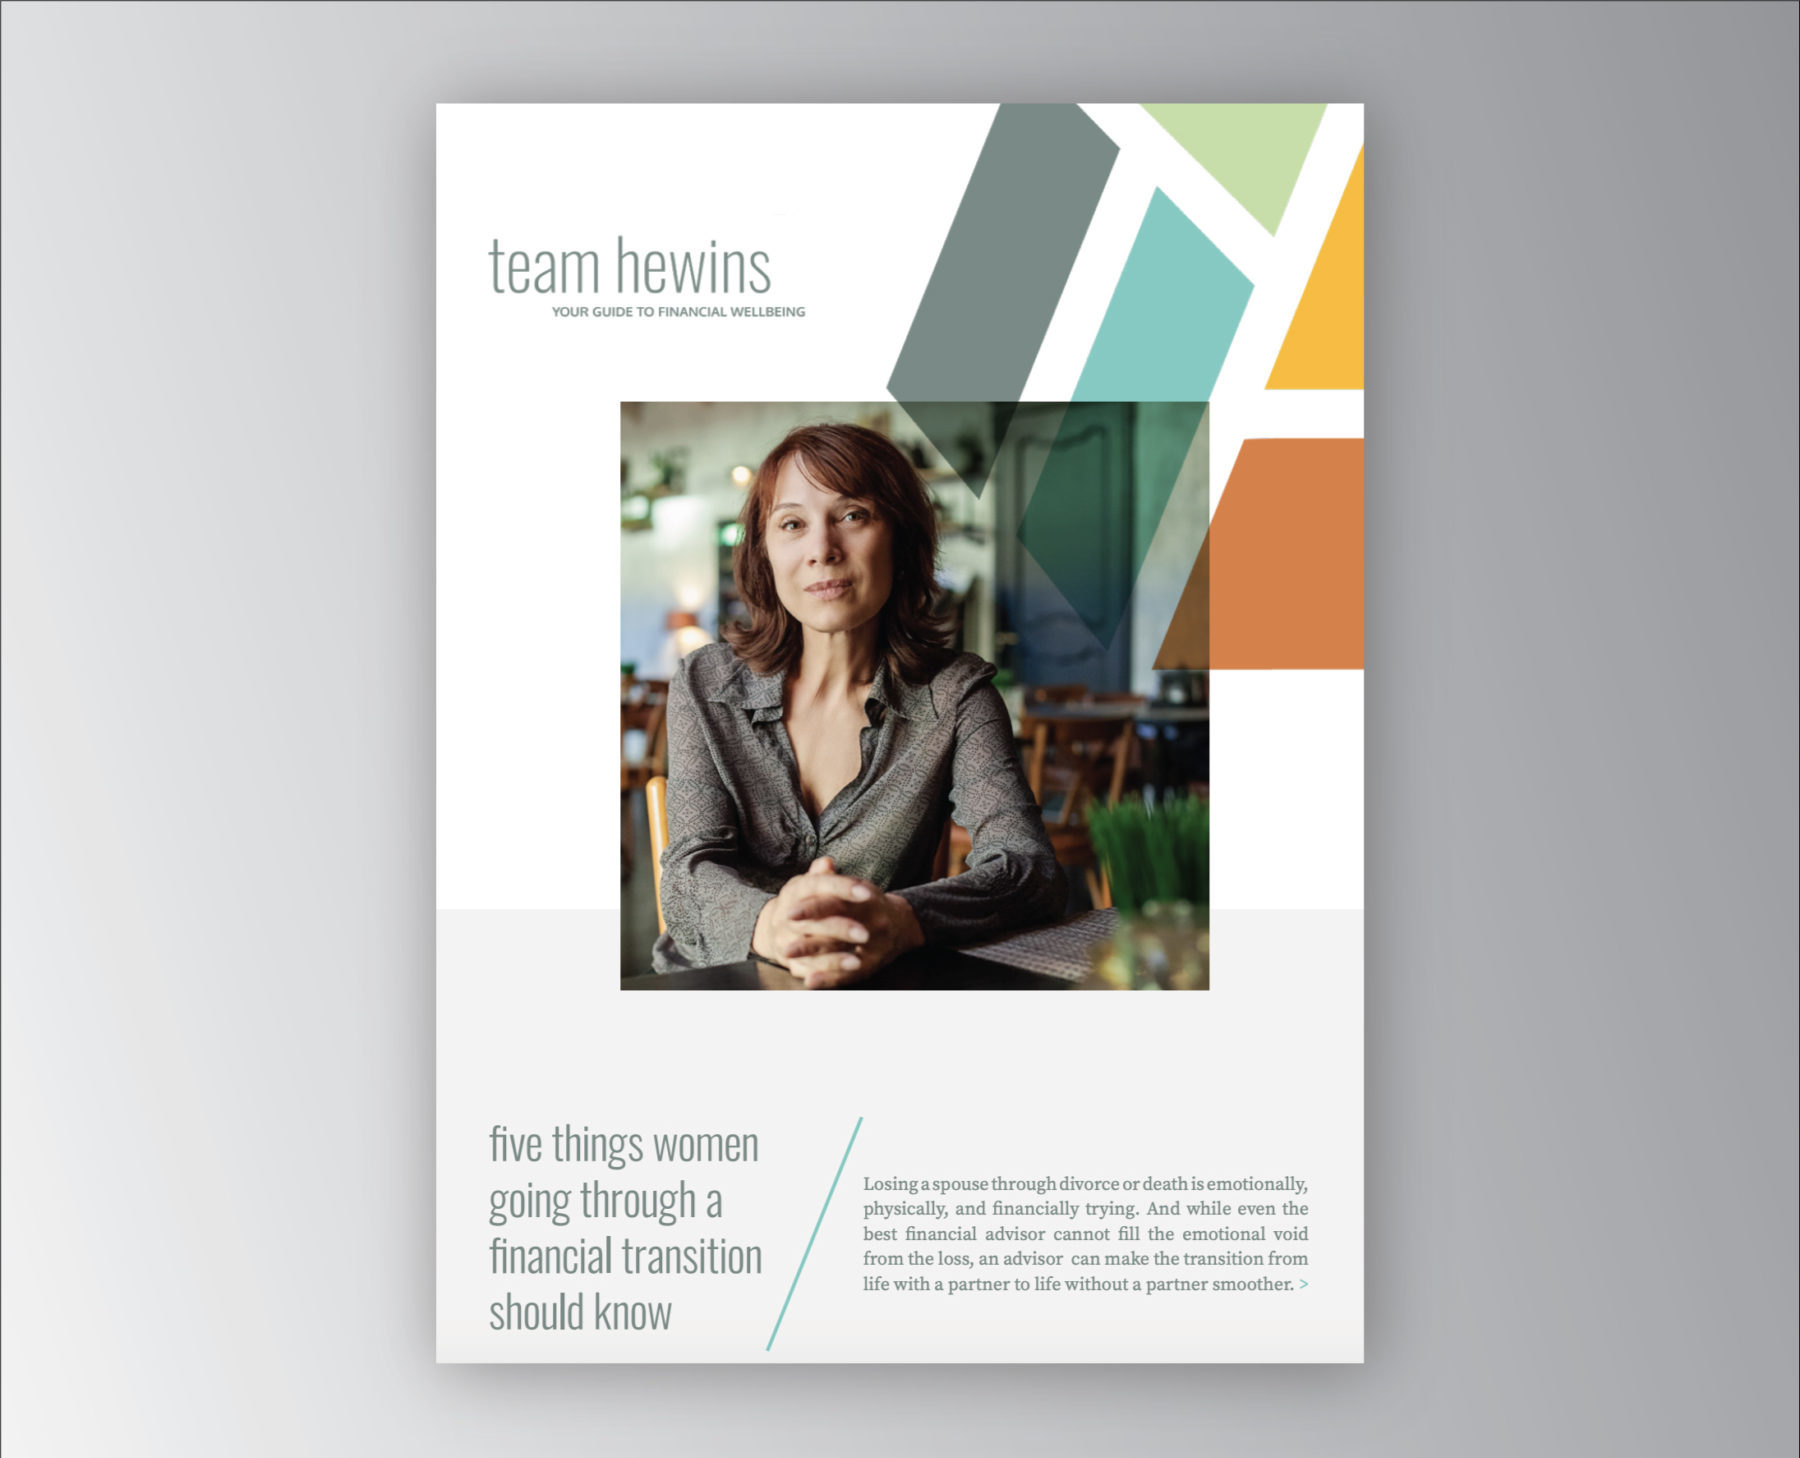 Women in Transition - Team Hewins eBook